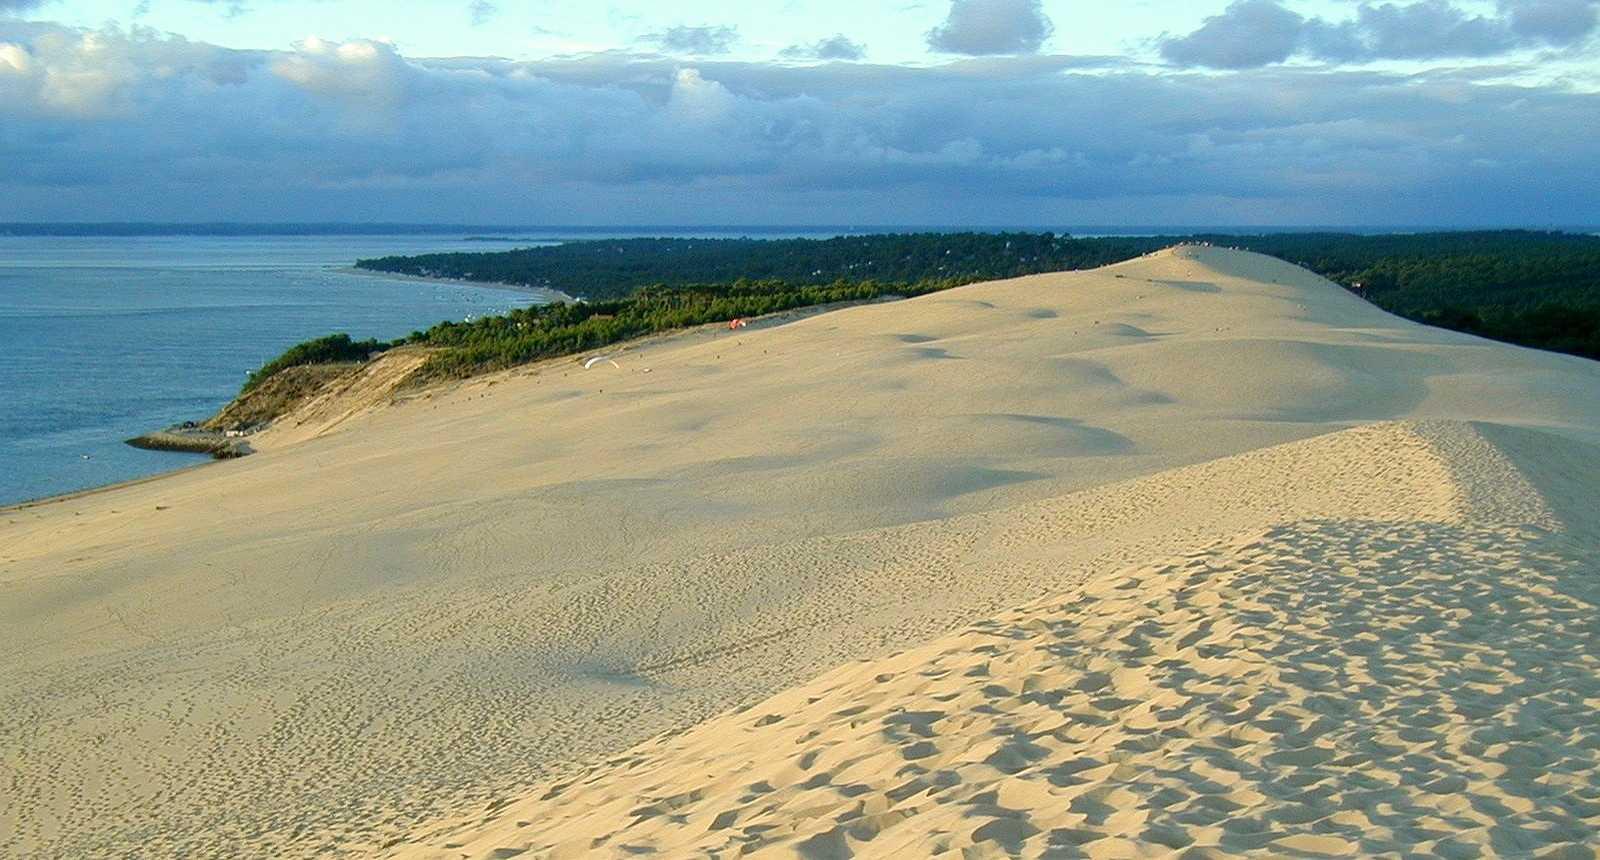 Vue du sommet de la Dune du Pilat